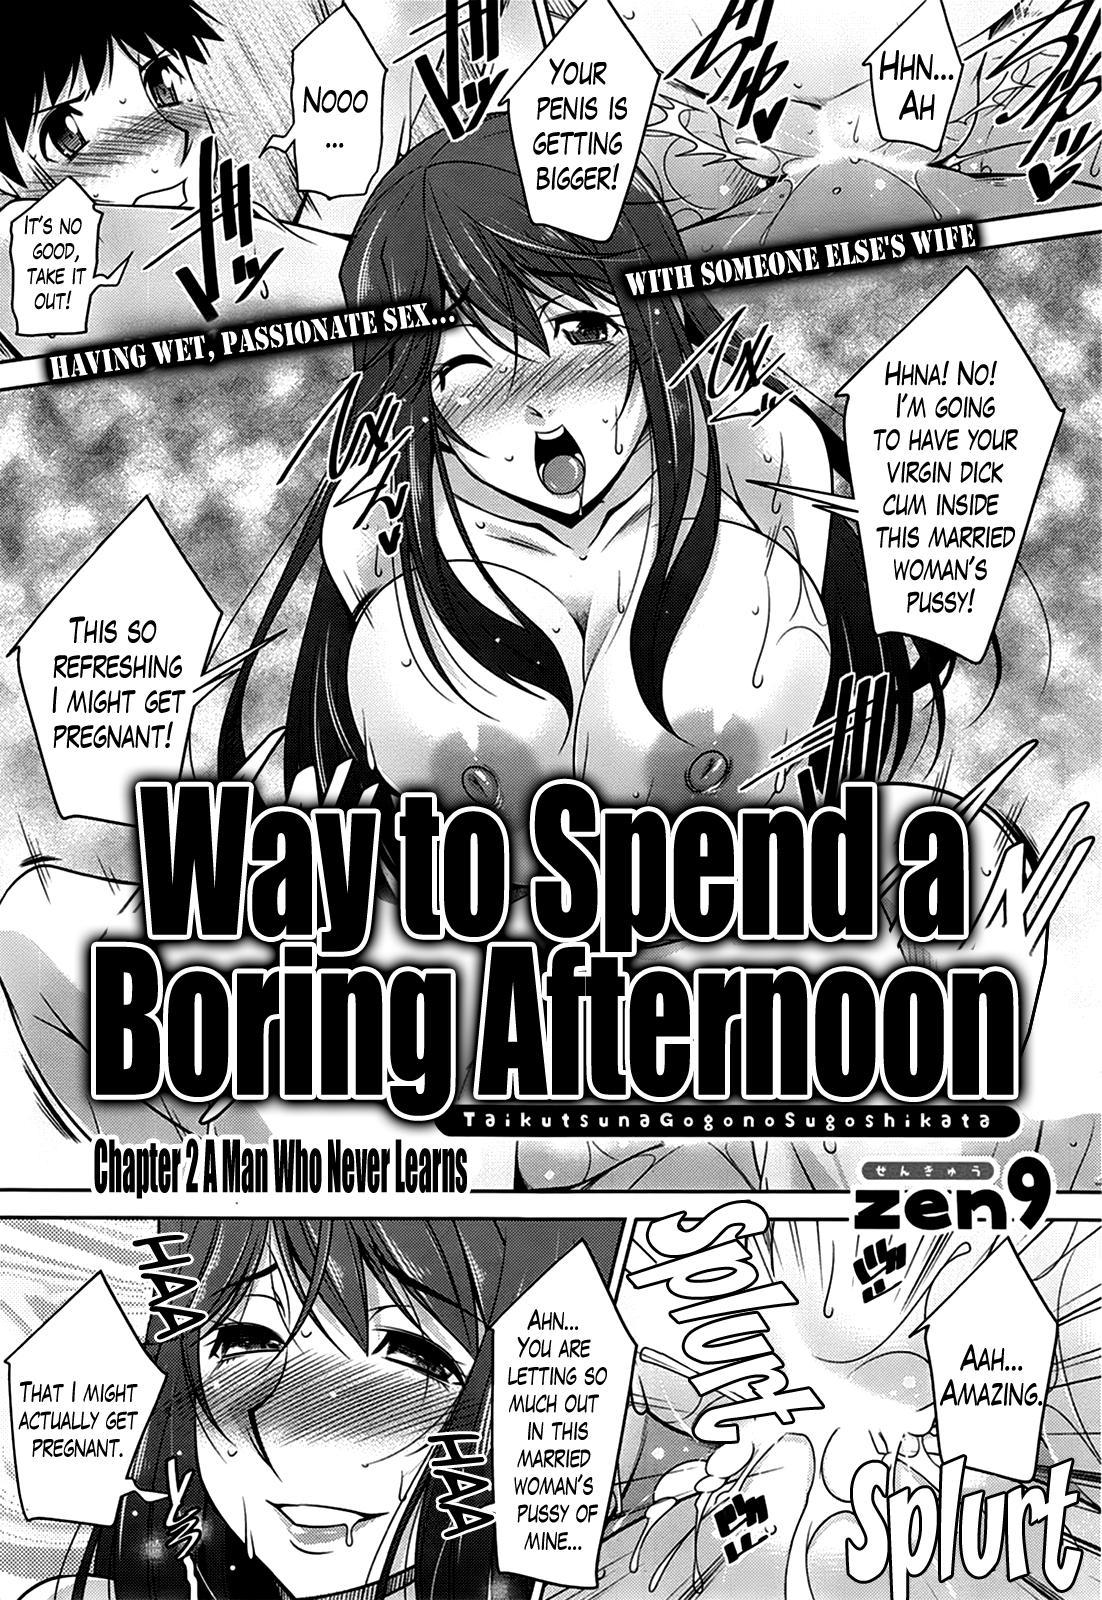 [Zen9] Taikutsu na Gogo no Sugoshikata Ch. 1-4   A Way to Spend a Boring Afternoon Ch. 1-4 (Action Pizazz DX 2013-12) [English](hentai2read.com)[Lazarus H] 20